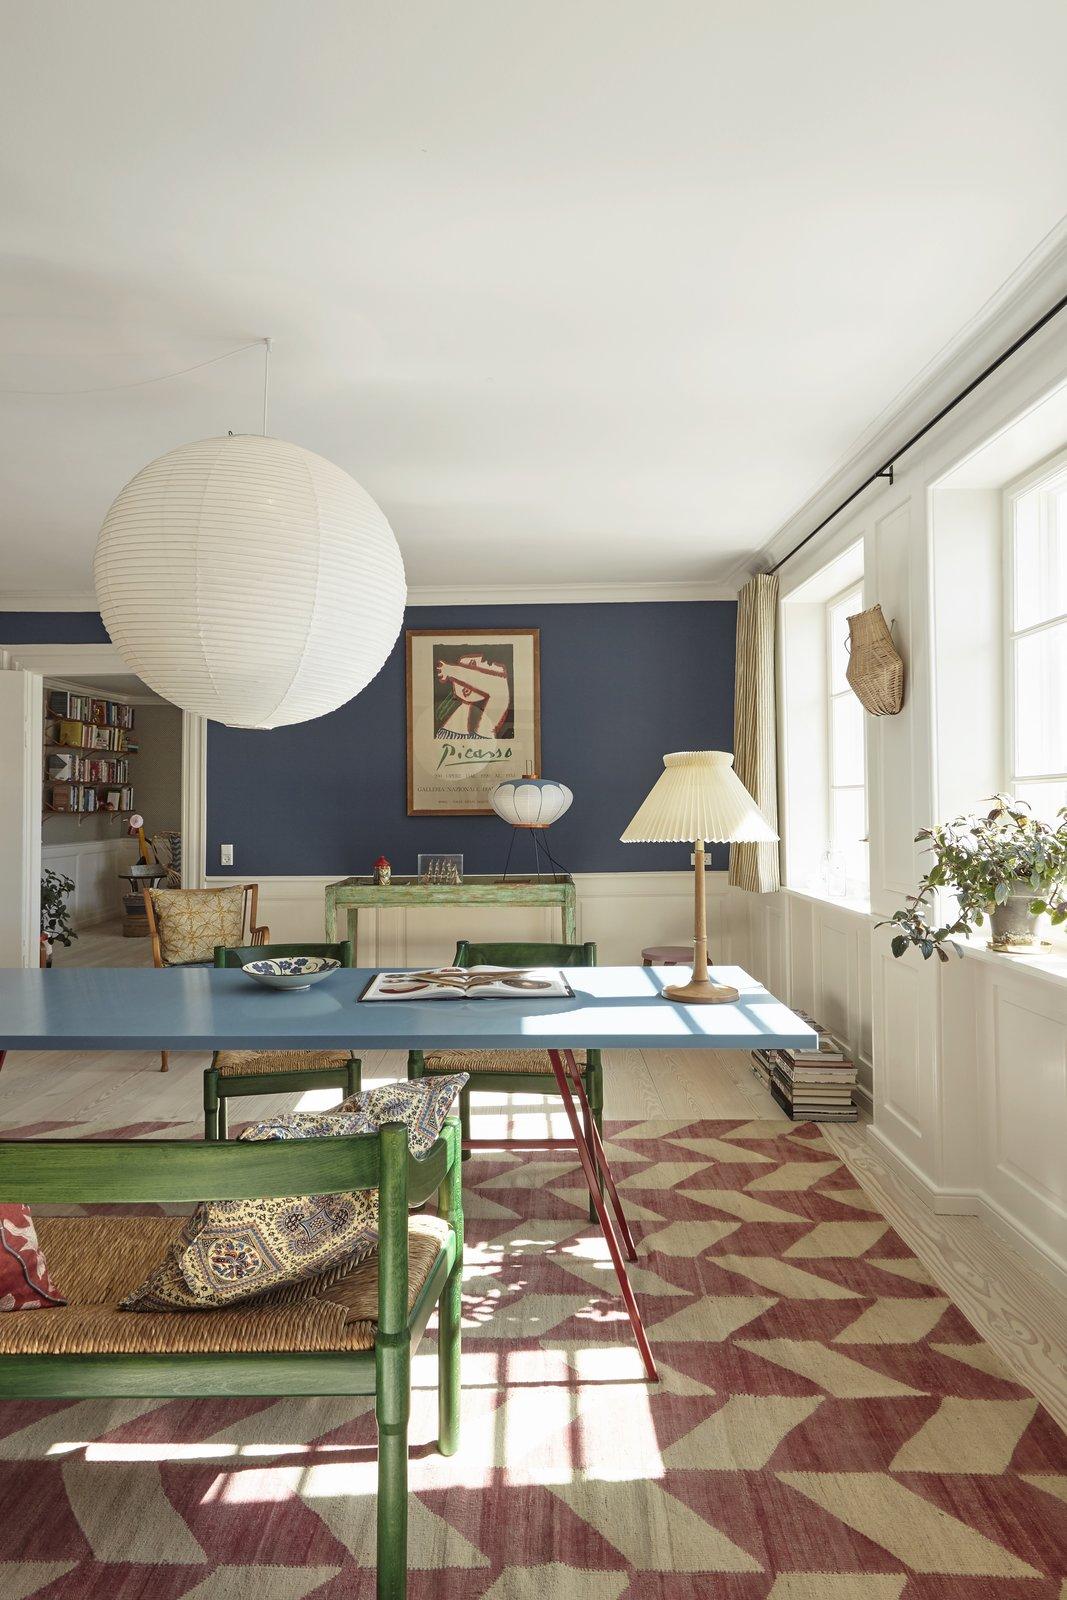 The Apartment by Tina Seidenfaden Busck